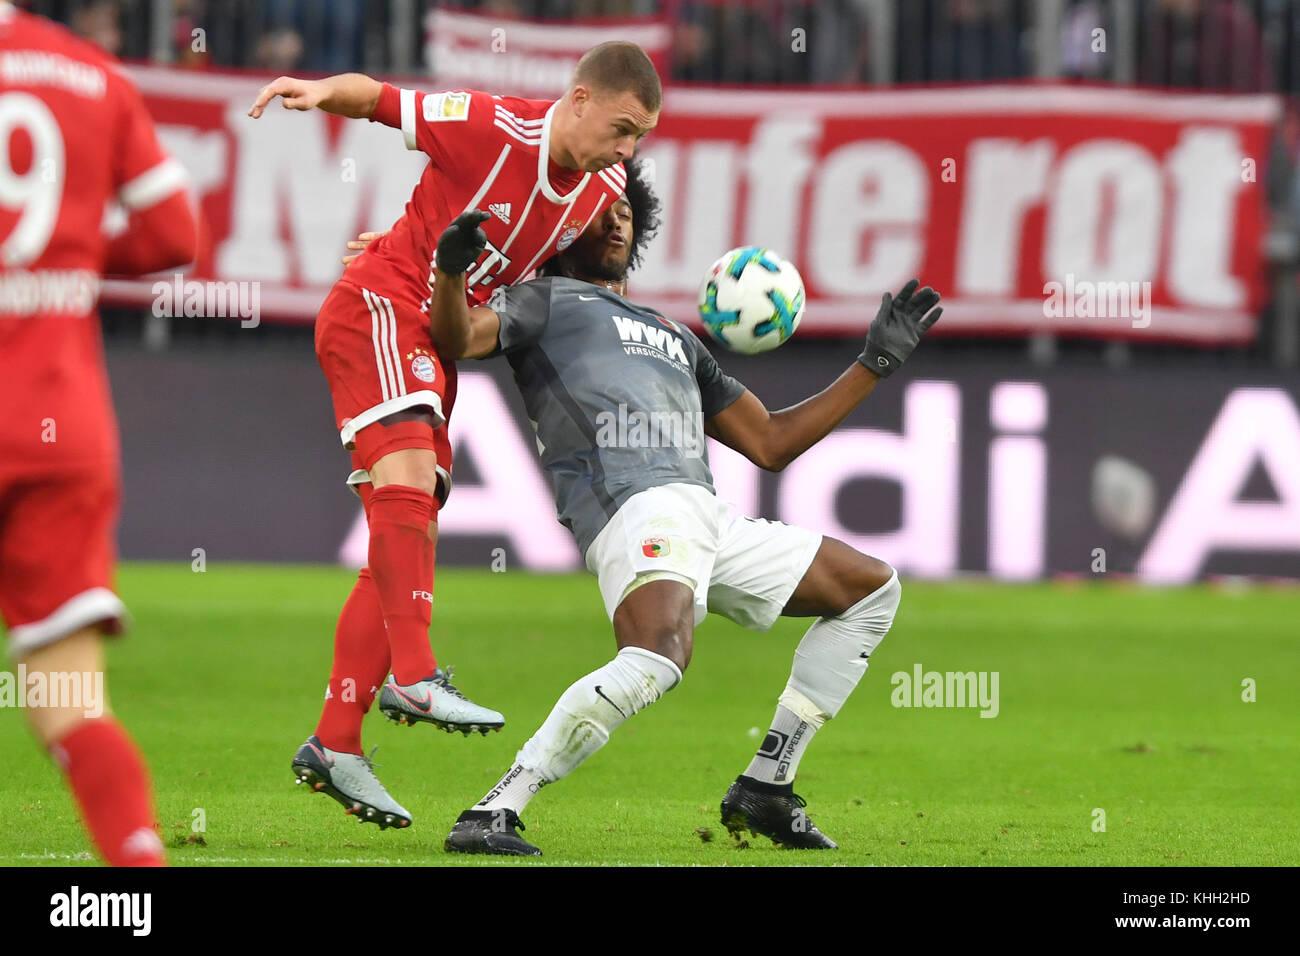 Joshua KIMMICH (FC Bayern Munich), F. CAIUBY DA SILVA (FC Augsburg), Aktion, duels. Fussball 1. Bundesliga, 12.Spieltag, - Stock Image